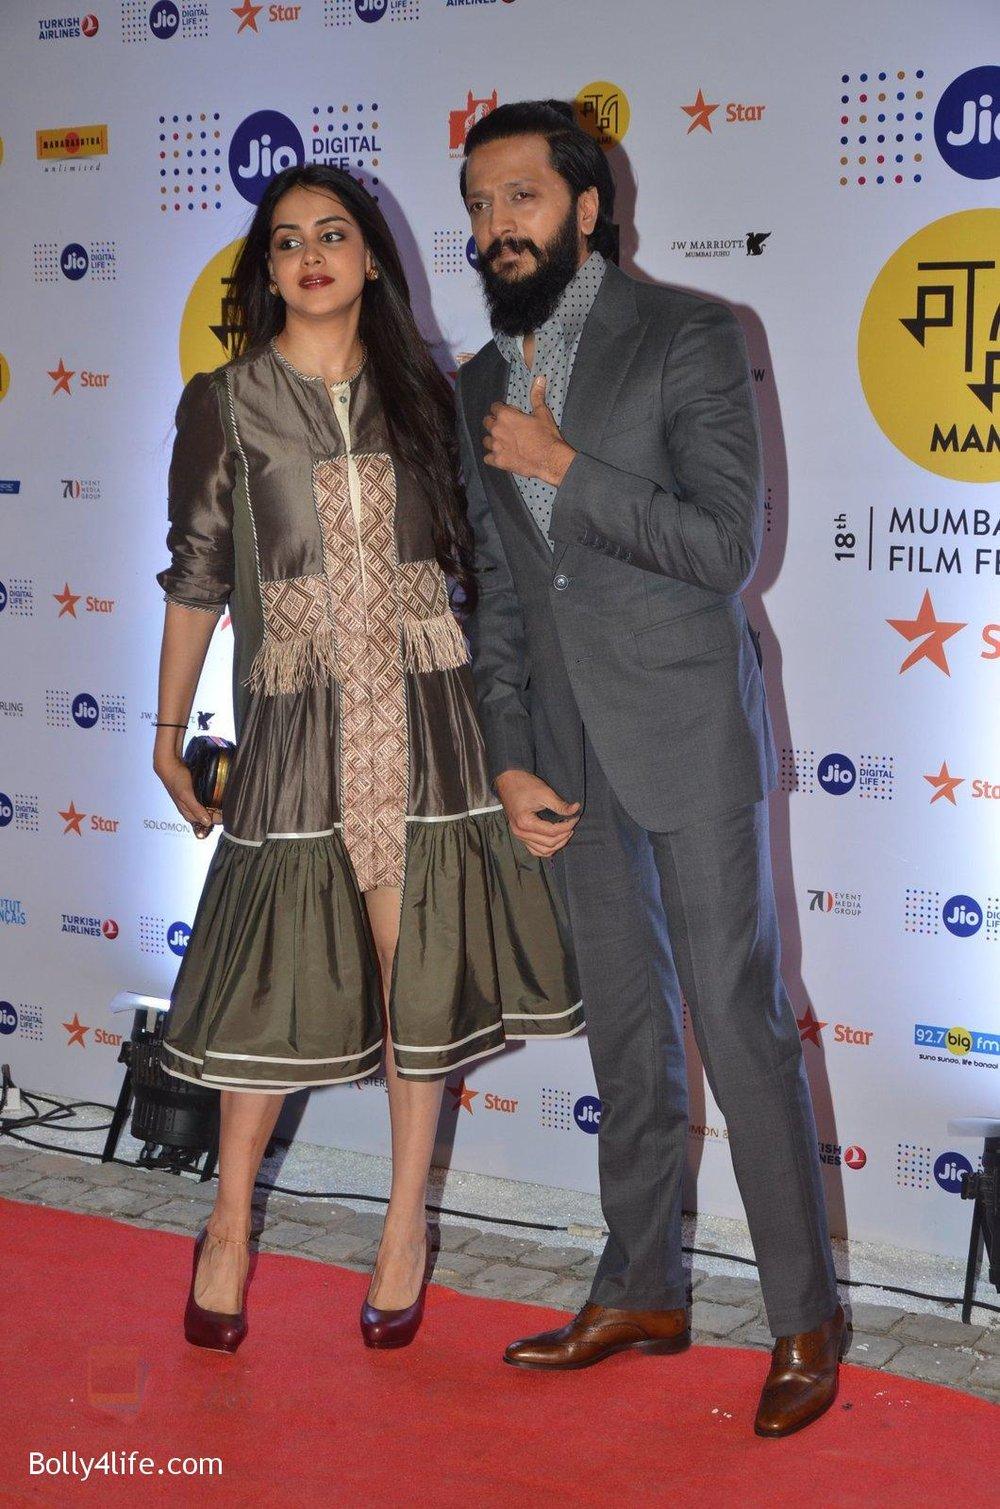 Genelia-D-Souza-Riteish-Deshmukh-at-MAMI-Film-Festival-2016-on-20th-Oct-2016-109.jpg